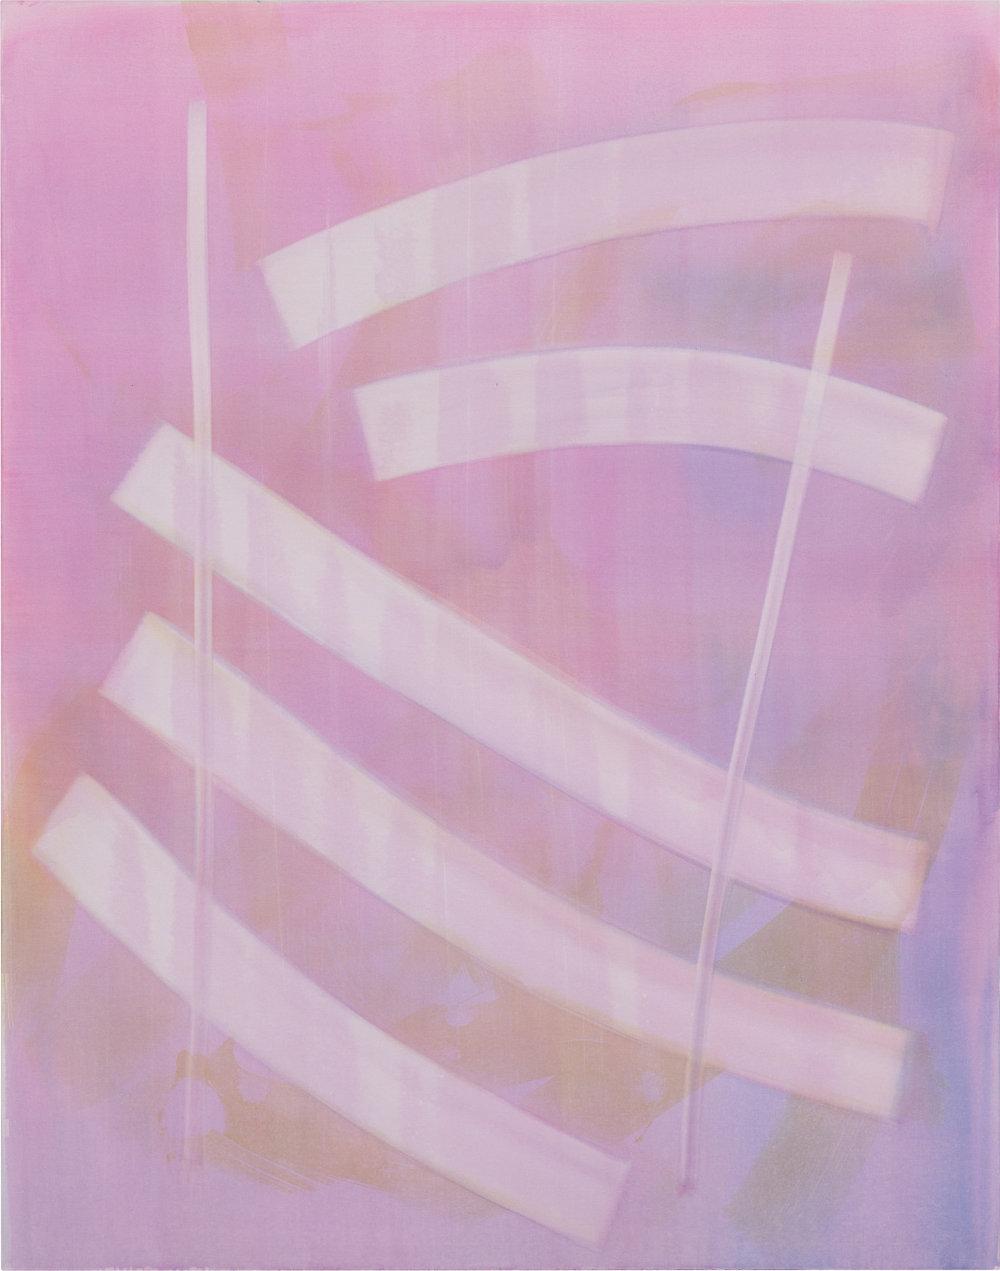 Ohne Titel [17306] | 2017 | Organic Preparation of Pigments on Canvas | 190 x 150 cm | ©Felix Büchel, Courtesy GALERIE ALBER